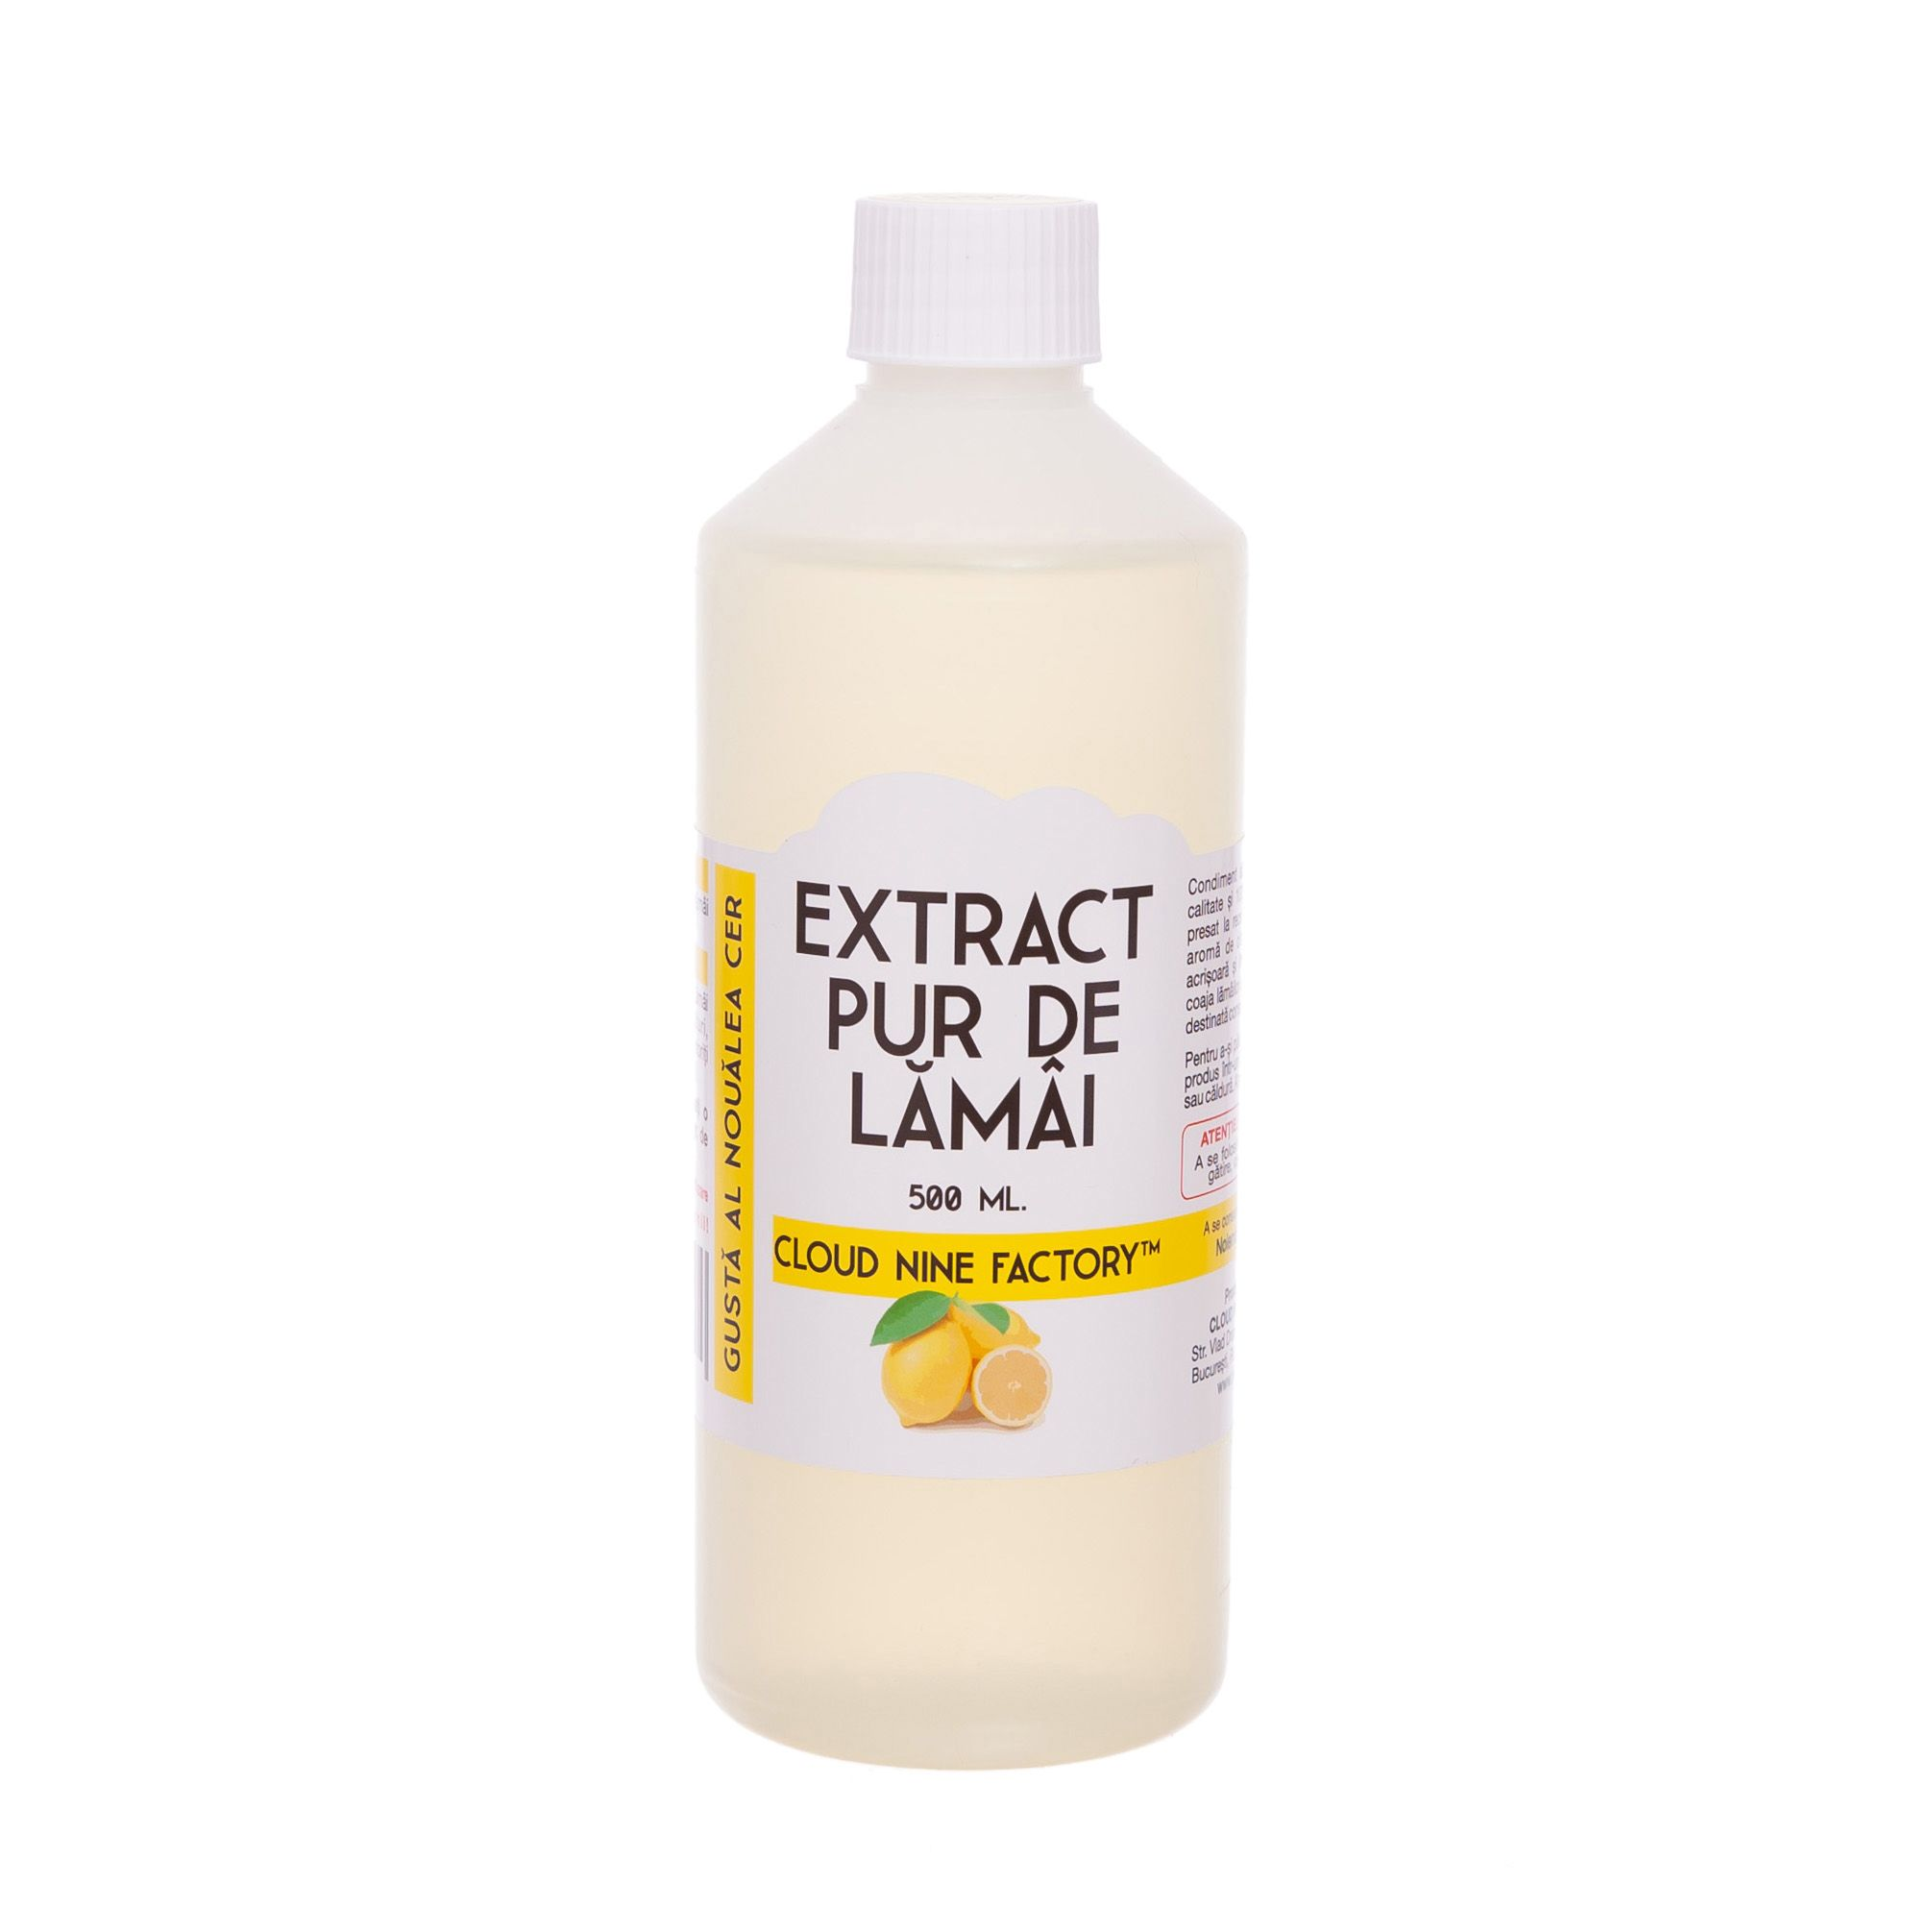 Extract Pur de Lămâi (500 ml.) Extract Pur de Lămâi (500 ml.) - IMG 2644 - Extract Pur de Lămâi (500 ml.) Extract Pur de Lămâi - IMG 2644 - Extract Pur de Lămâi